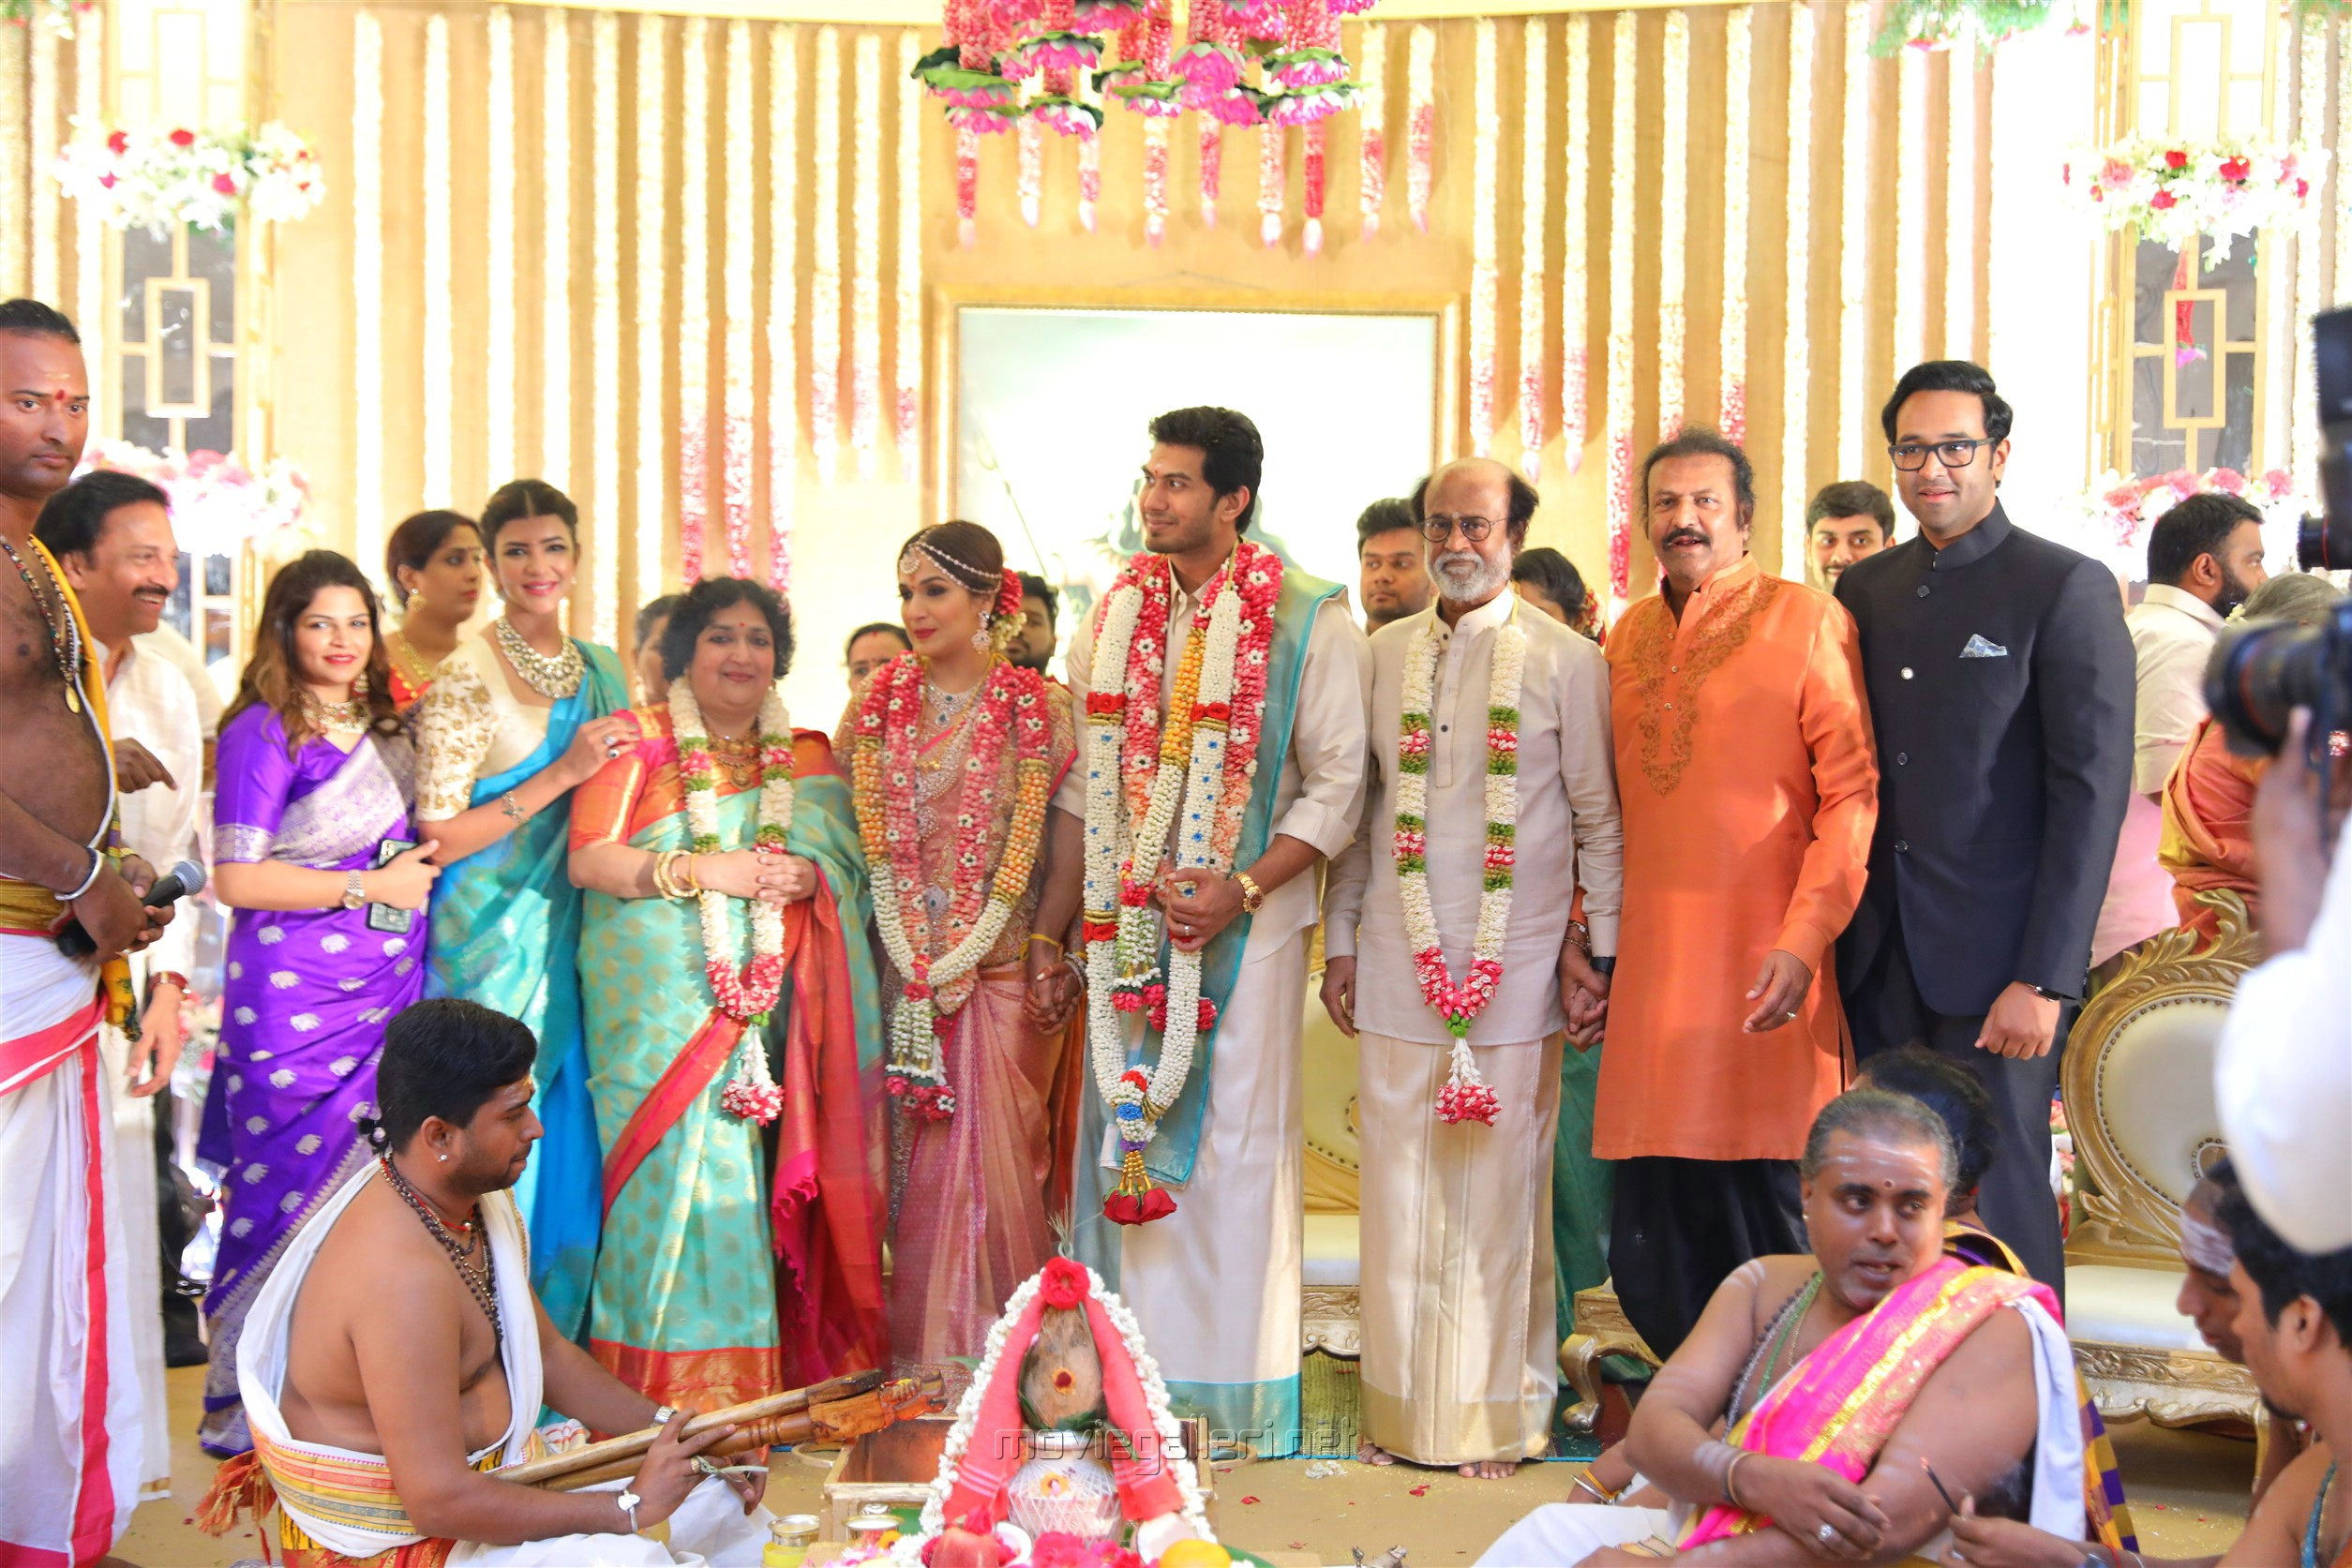 Lakshmi Manchu, Mohan Babu @ Vishagan Soundarya Rajinikanth Marriage Photos HD